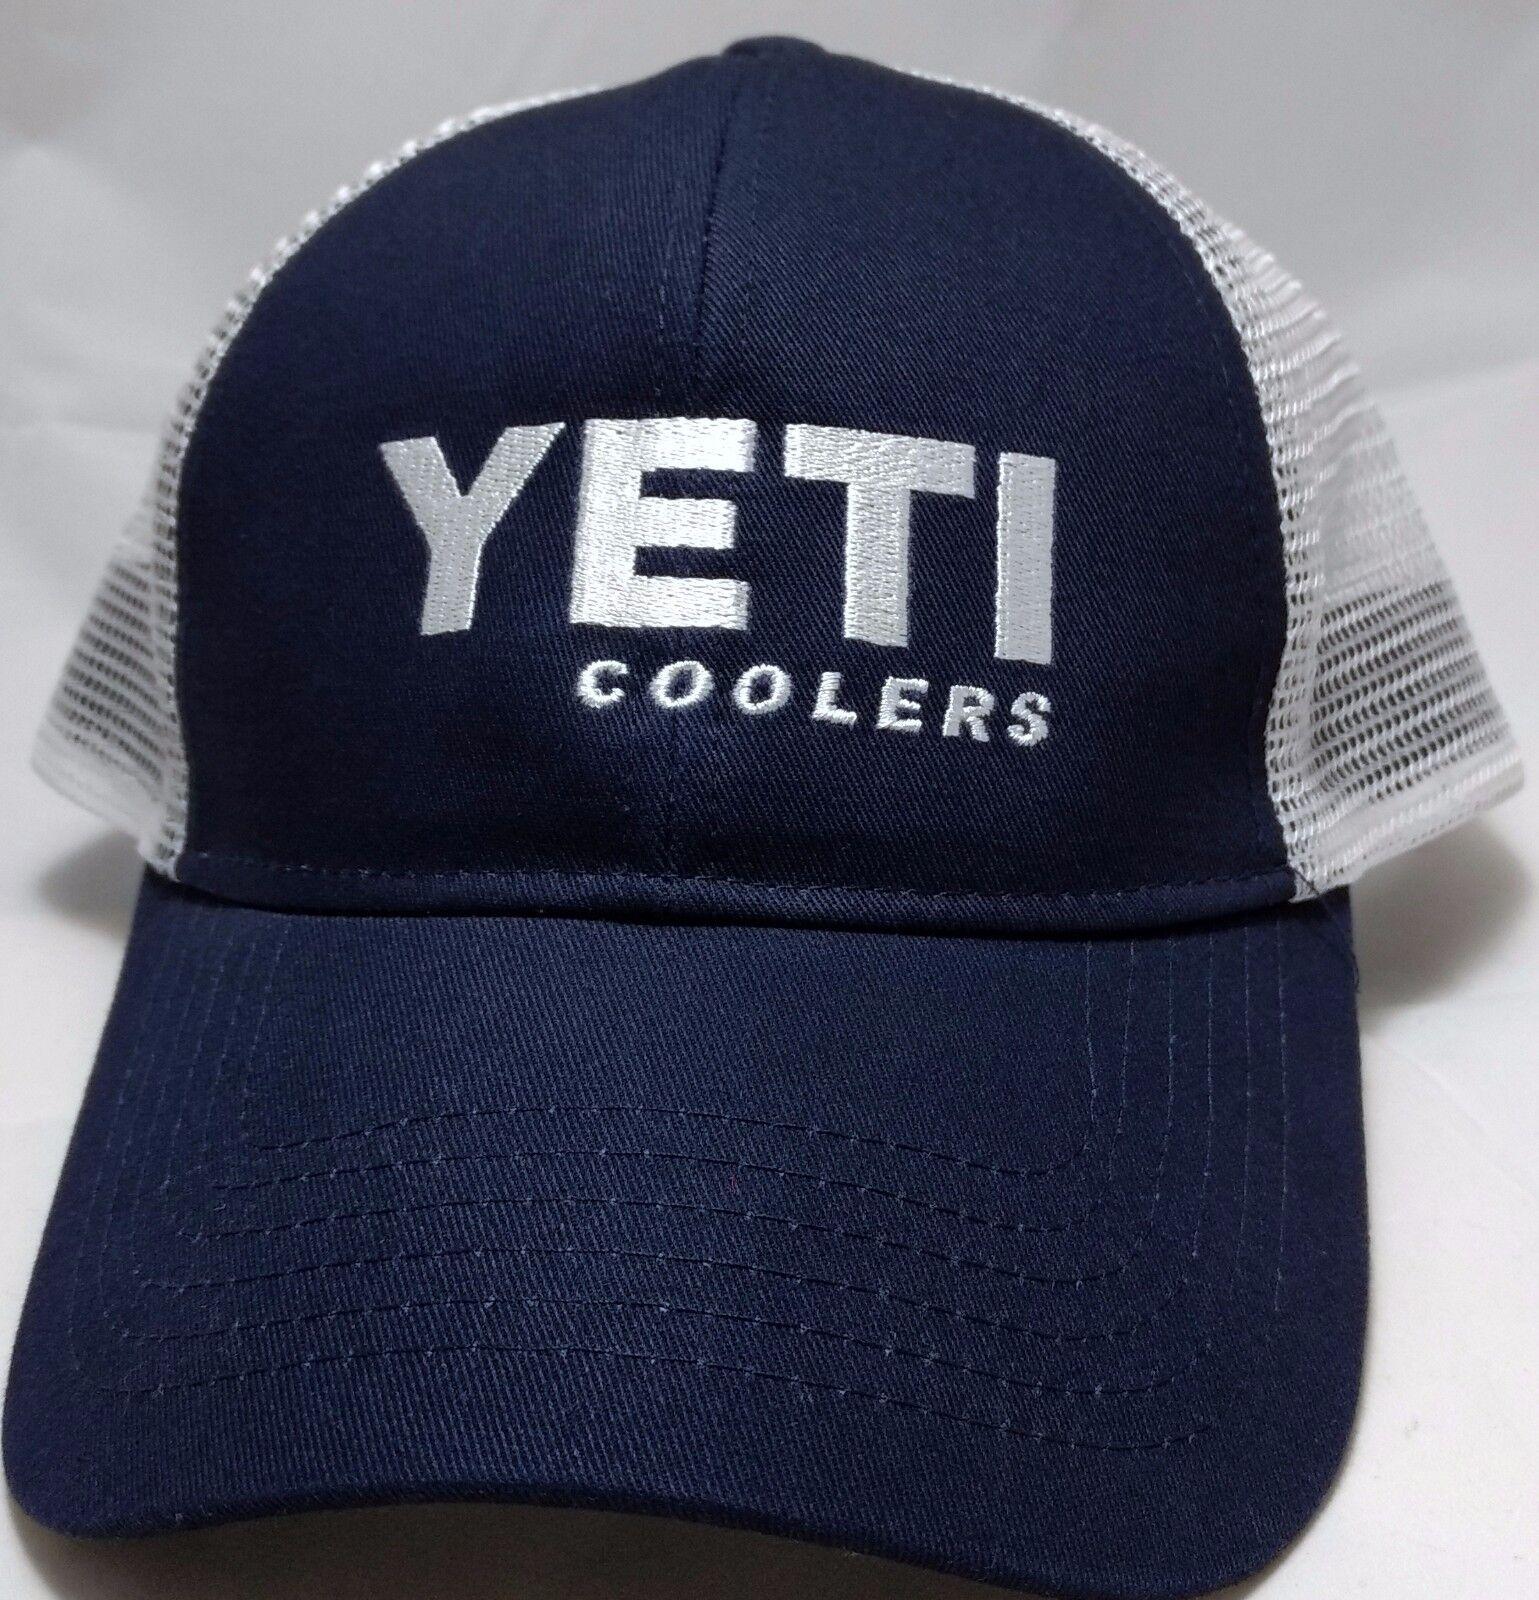 YETI COOLERS snapback hat mesh cap adjustable blue trucker mesh hat white b0a941